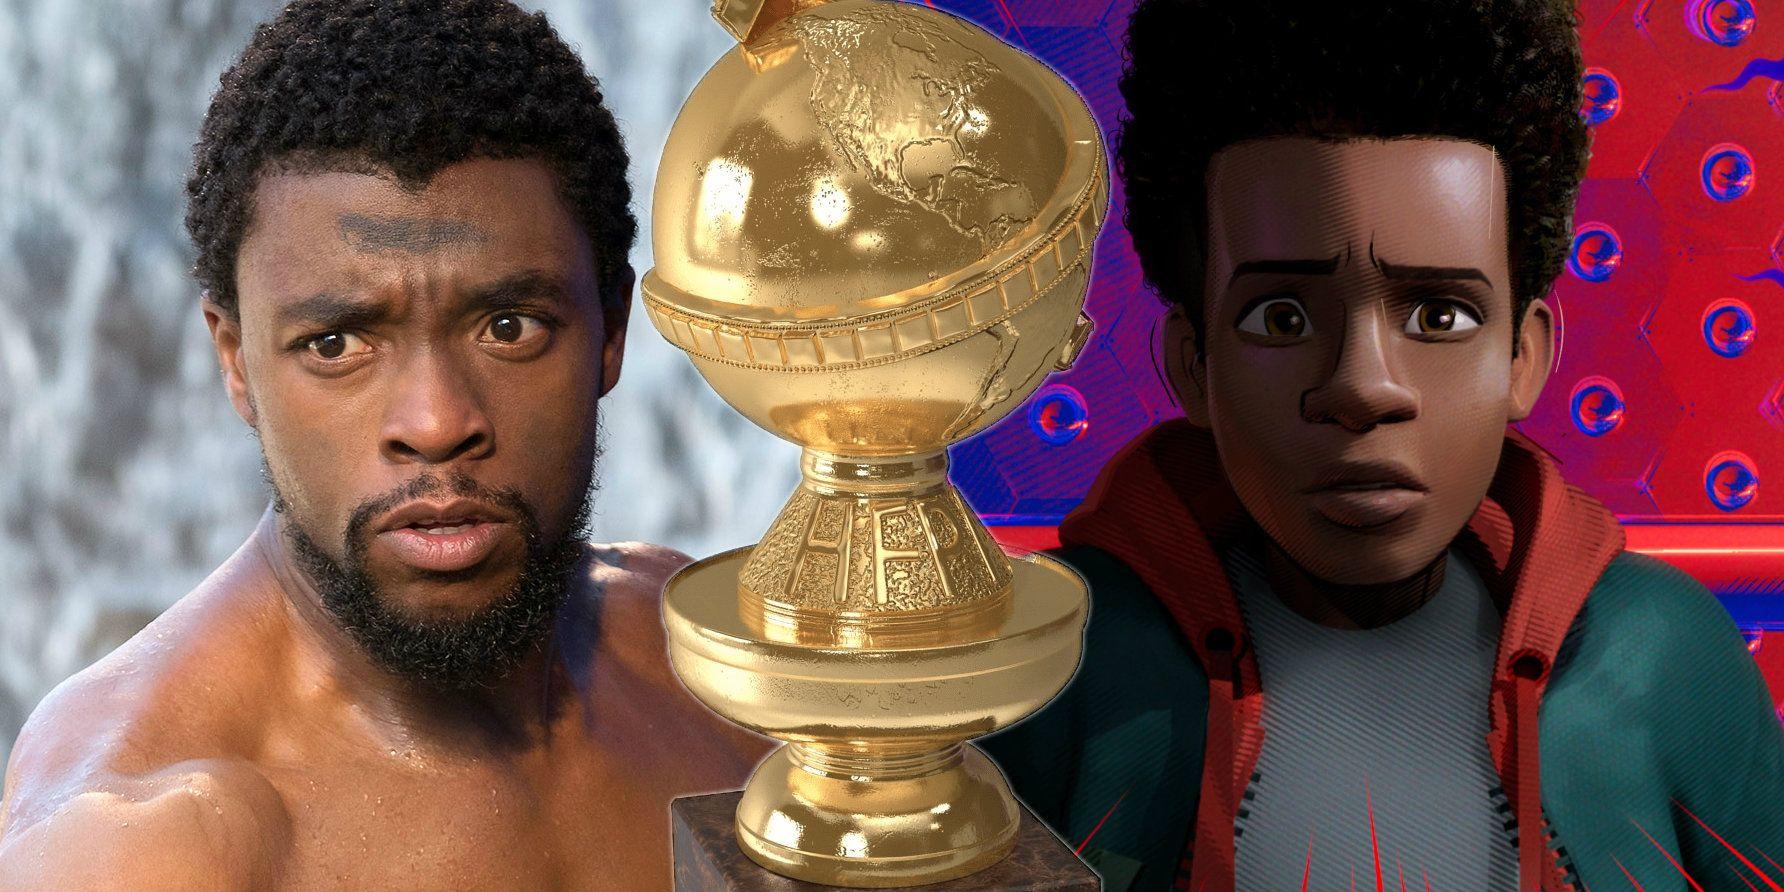 Black Panther Spider Verse Land Golden Globe Nominations